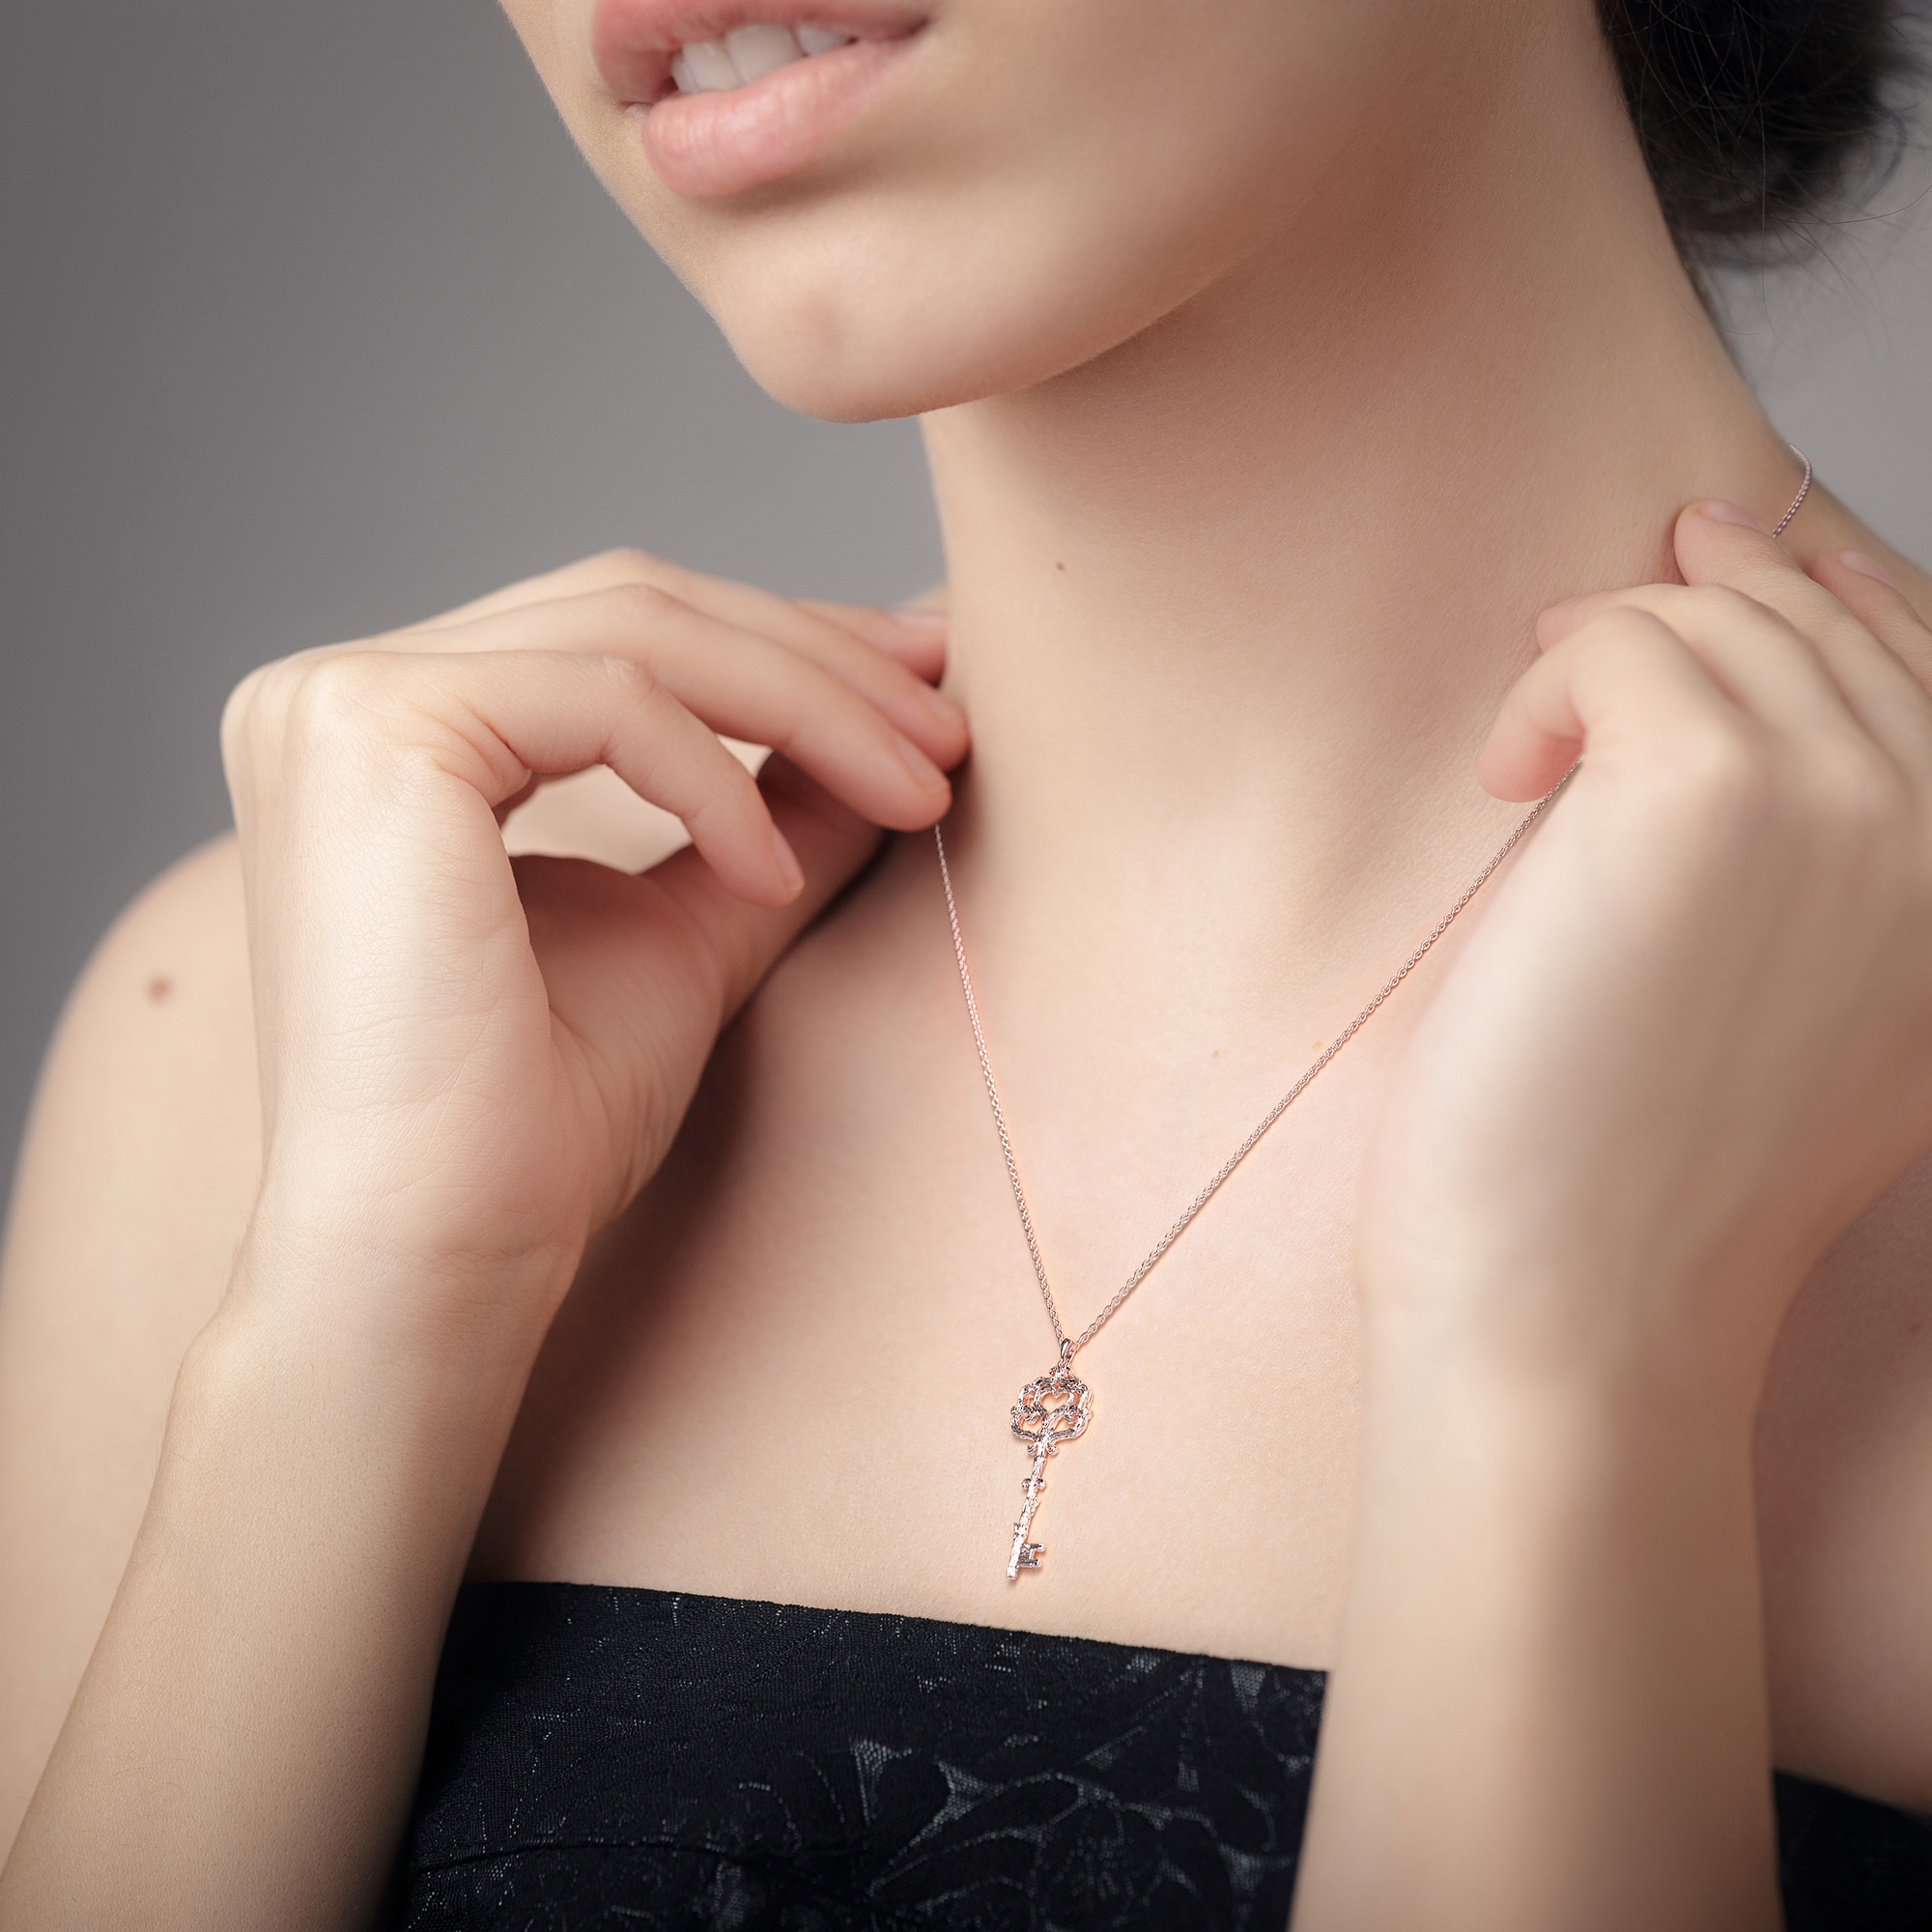 Key Pendant, Rose Gold Pendant, Designer Pendant, Branch Pendant, Gold Necklace, Key Necklace.